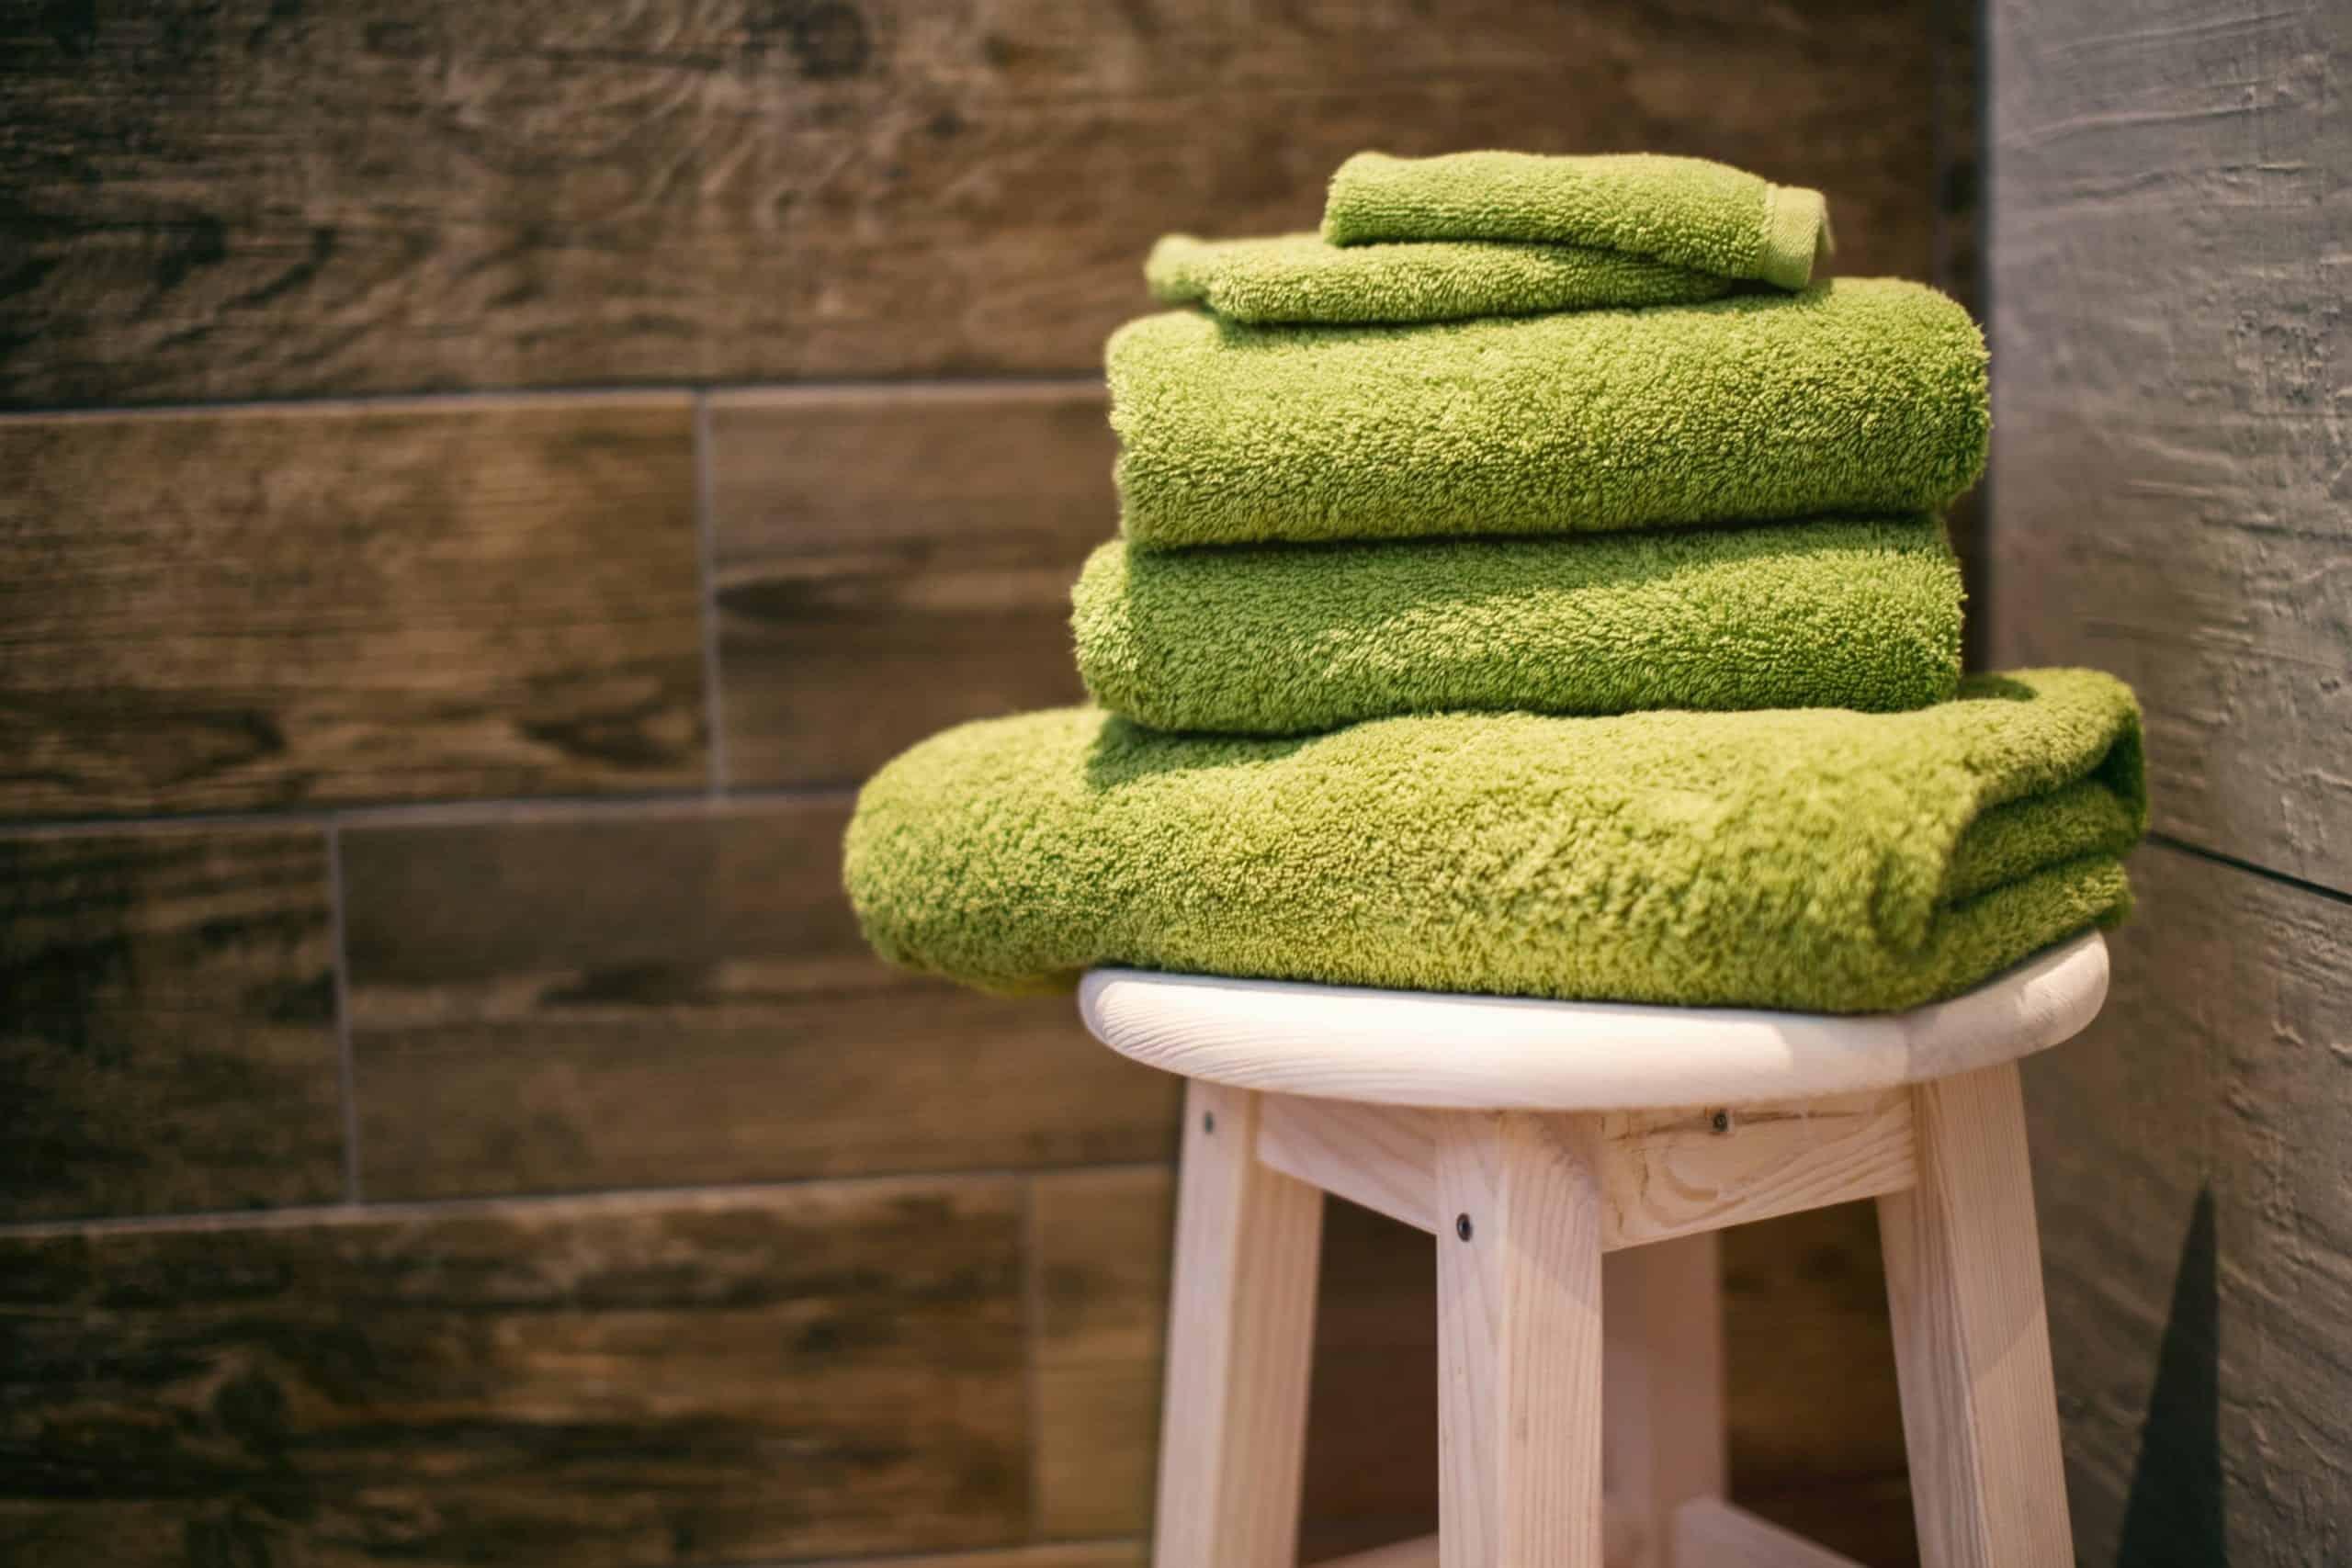 clean towel using vinegar